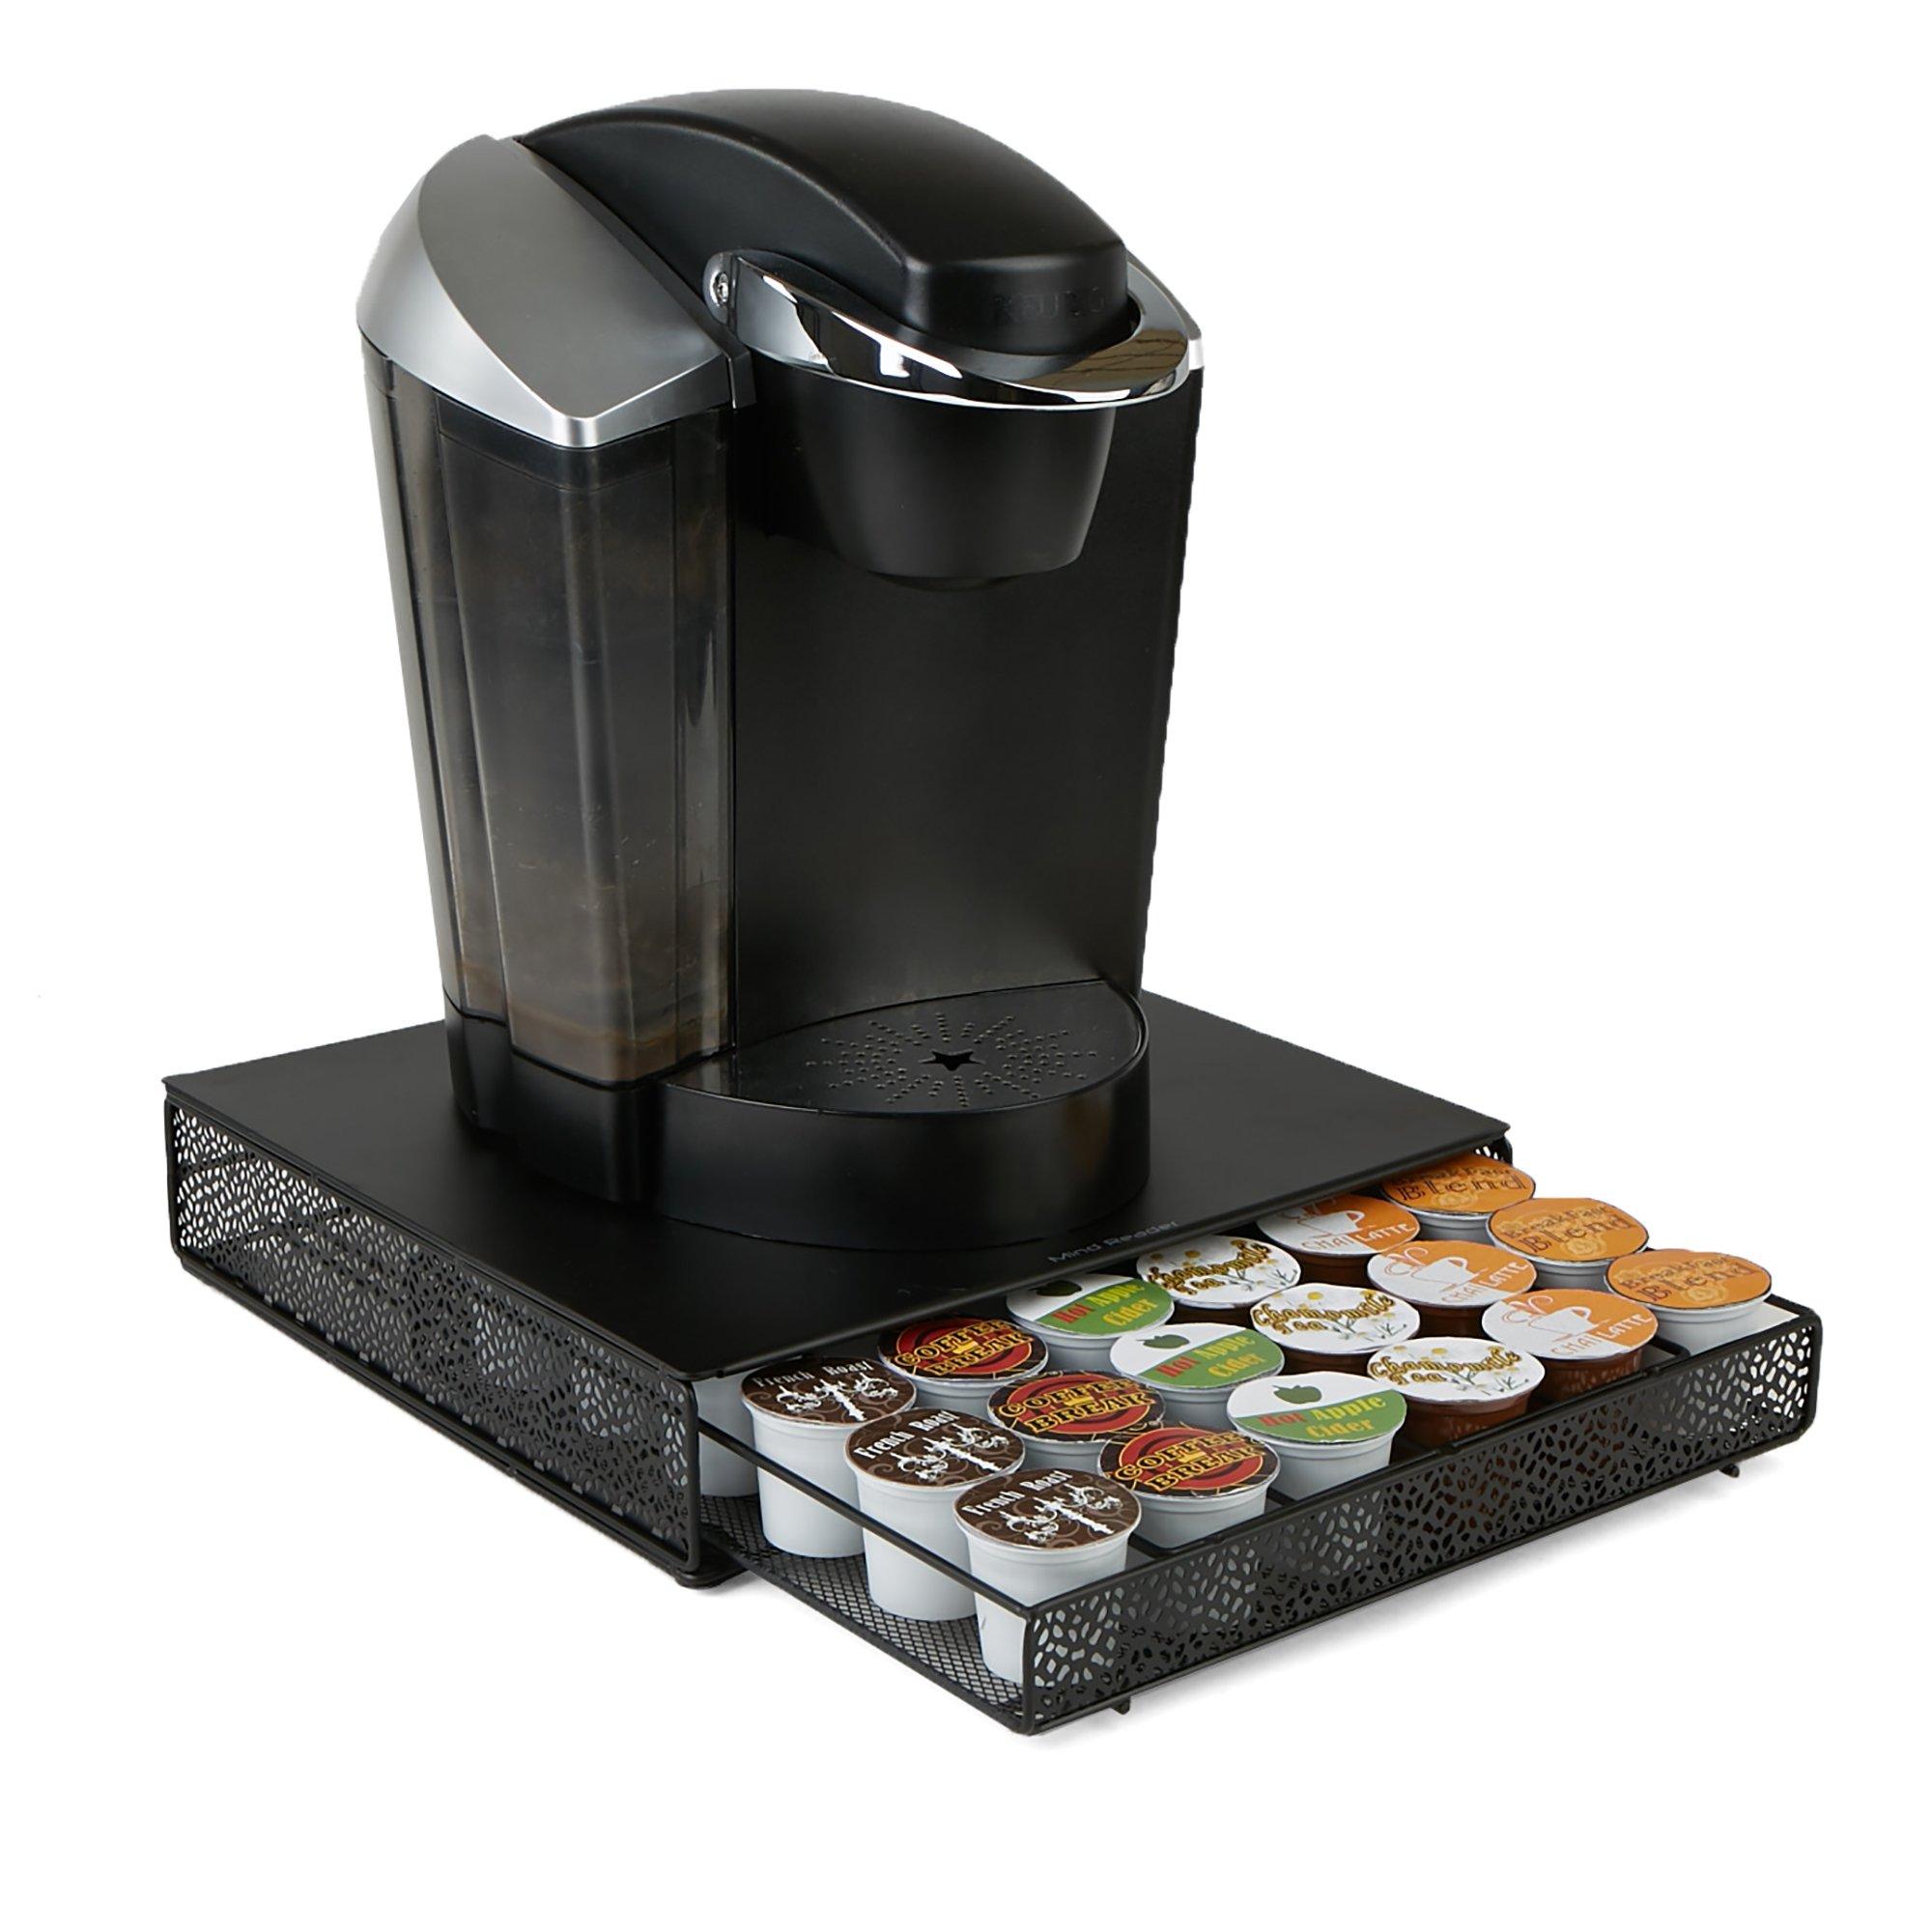 Mind Reader MTRAY-BLK 36 Capacity K-Cup Coffee Pod Storage Organizer Drawer Metal Mesh, Black